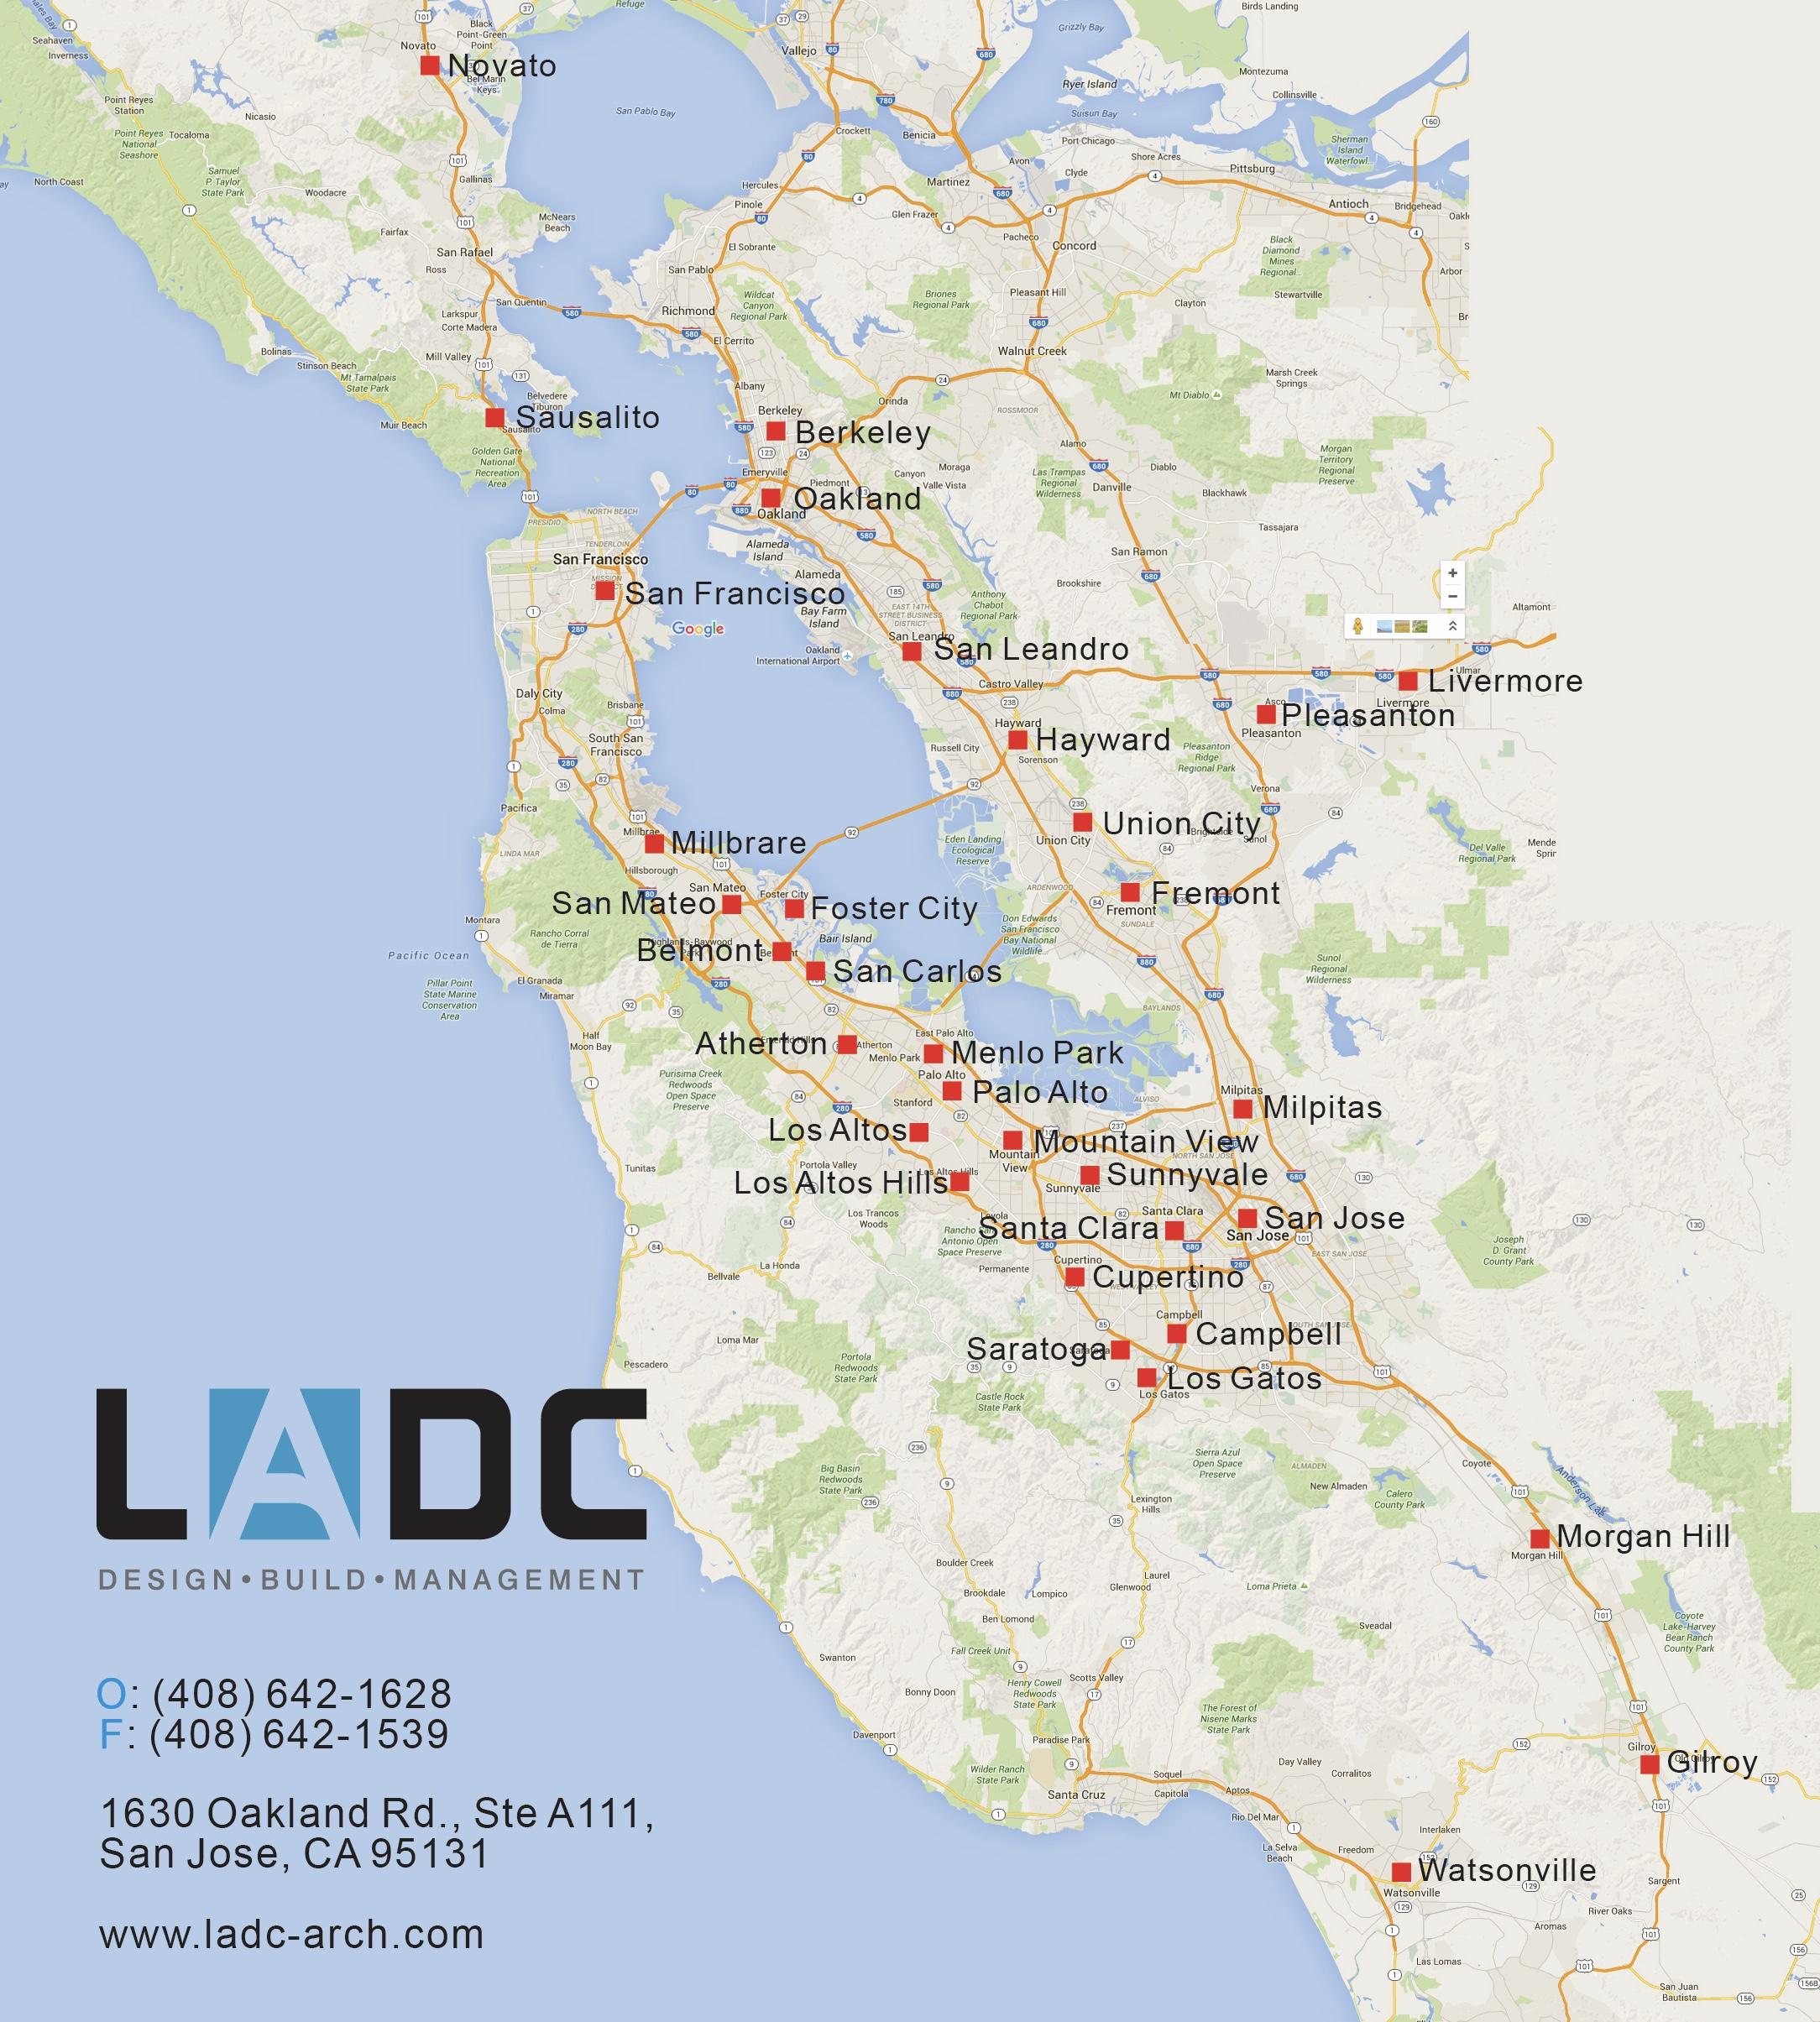 LADC MAP